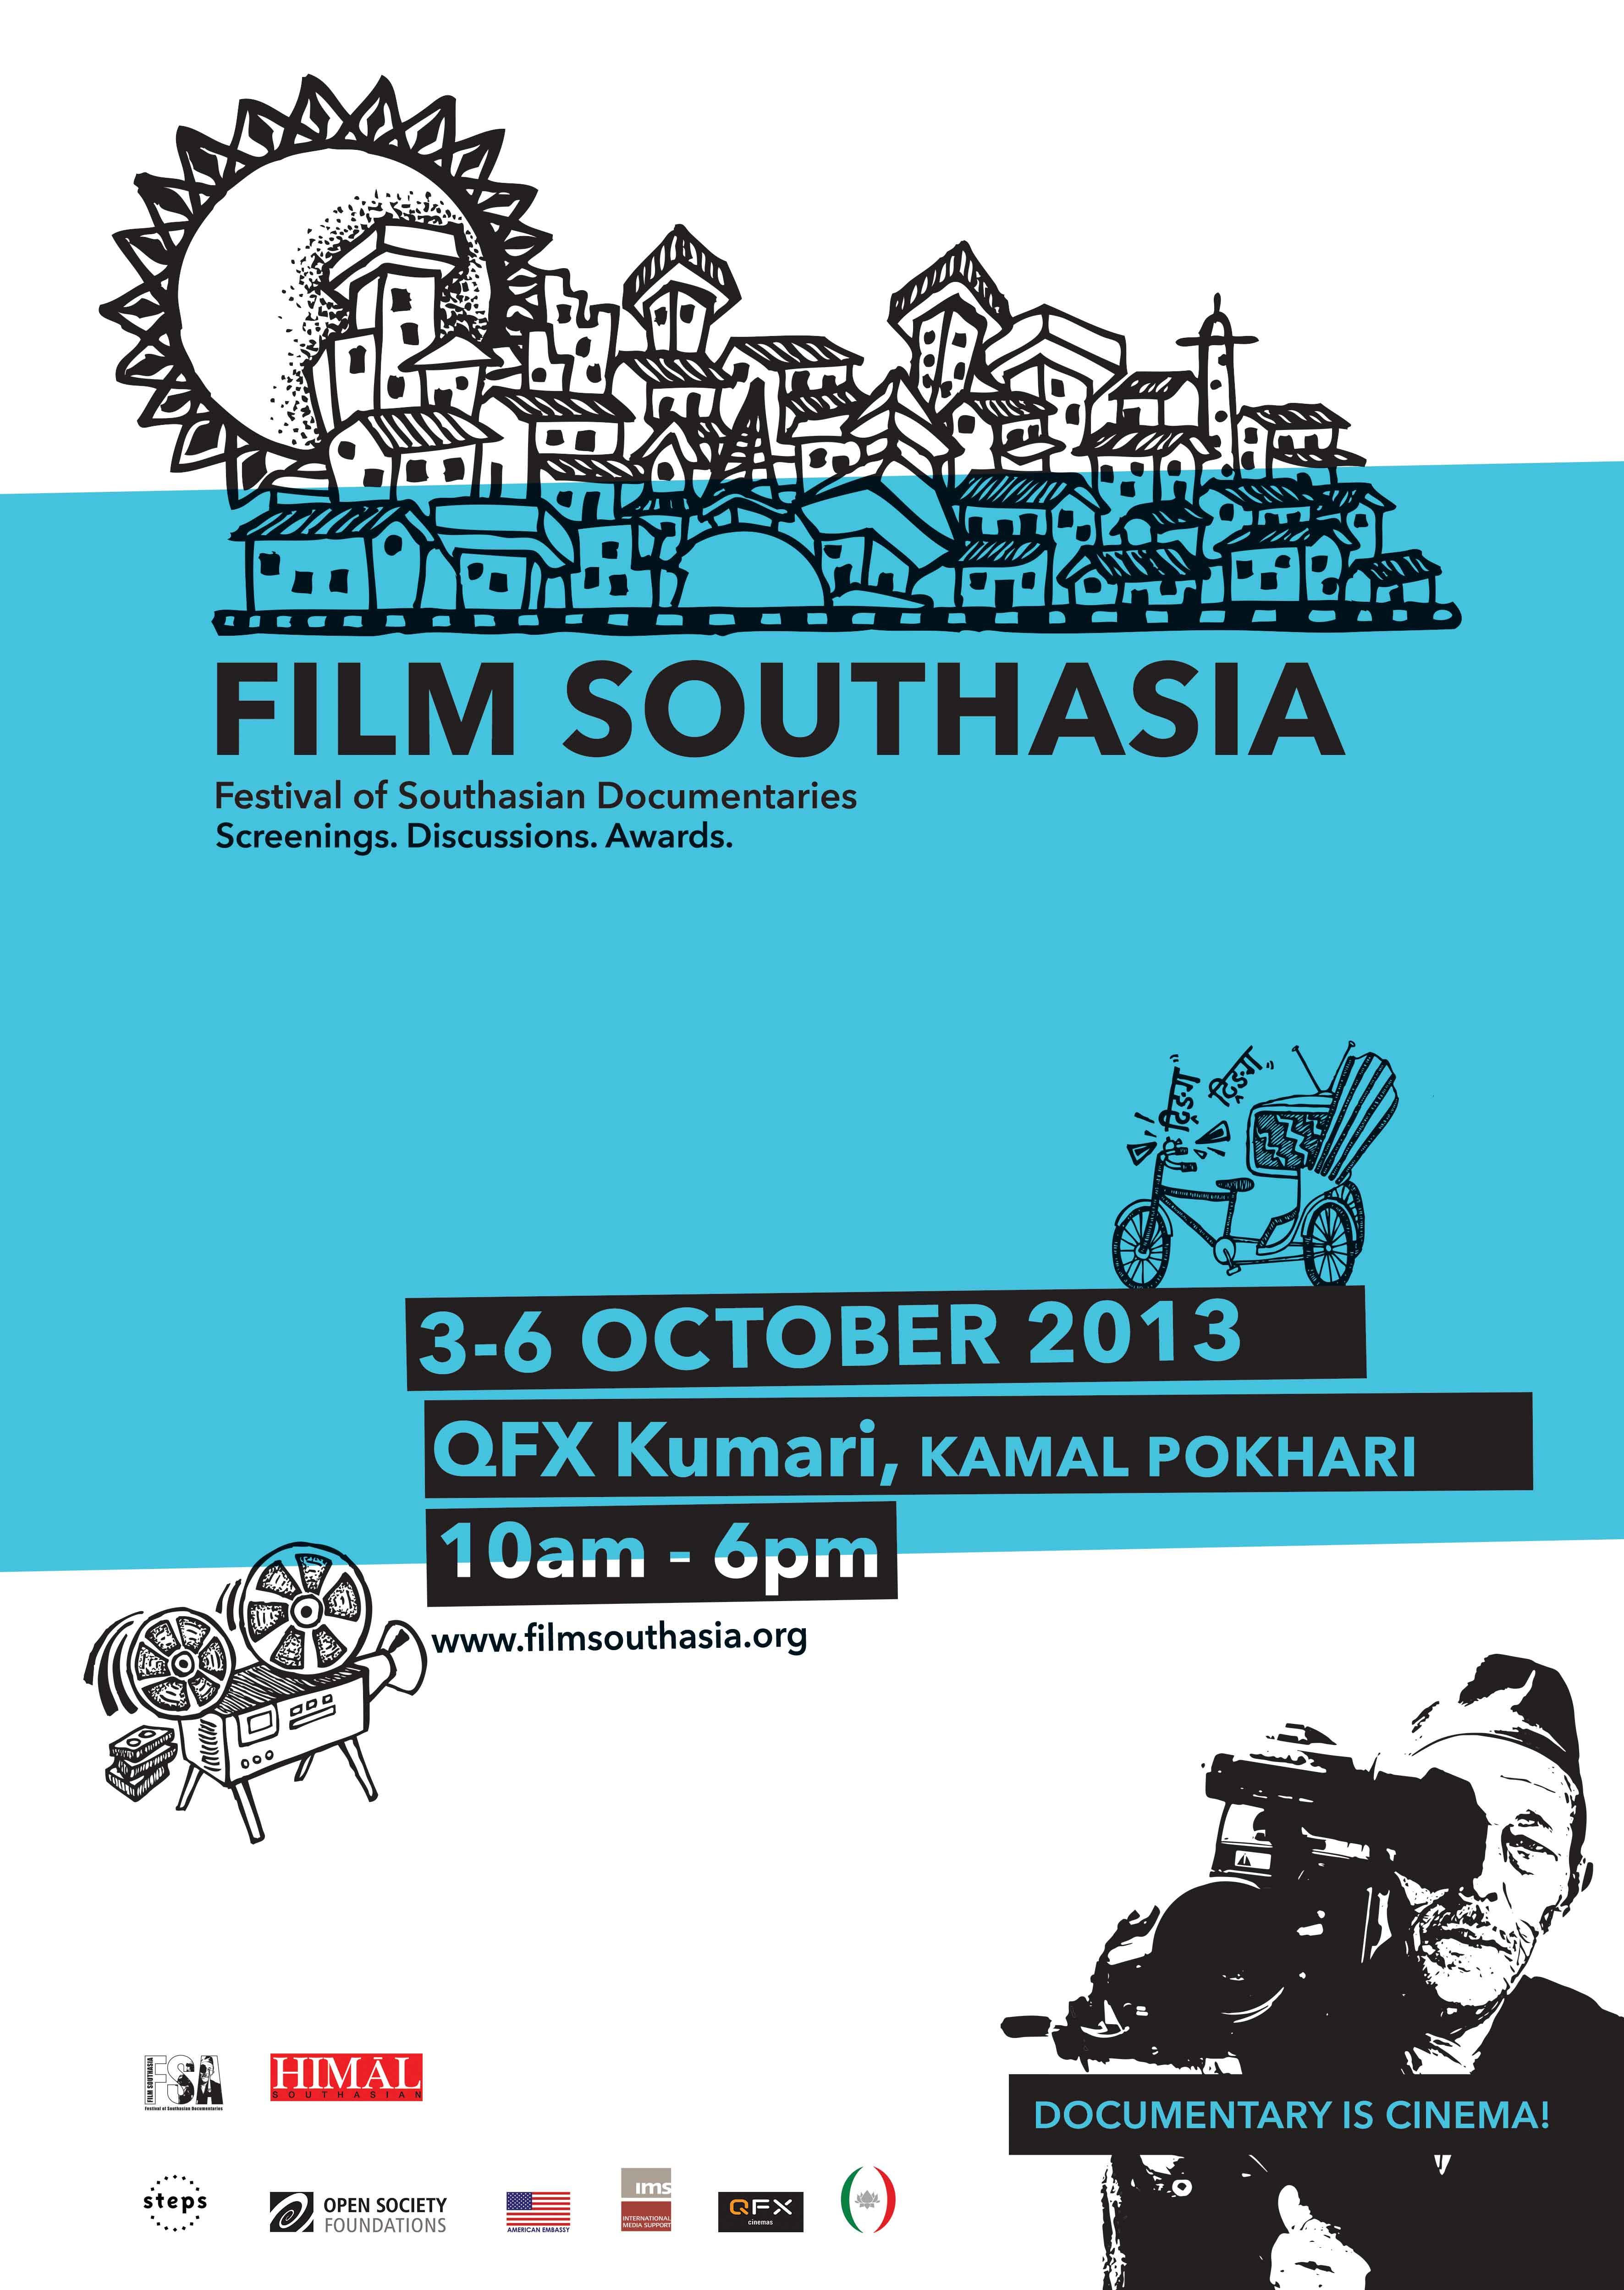 Film Southasia 2013 Poster